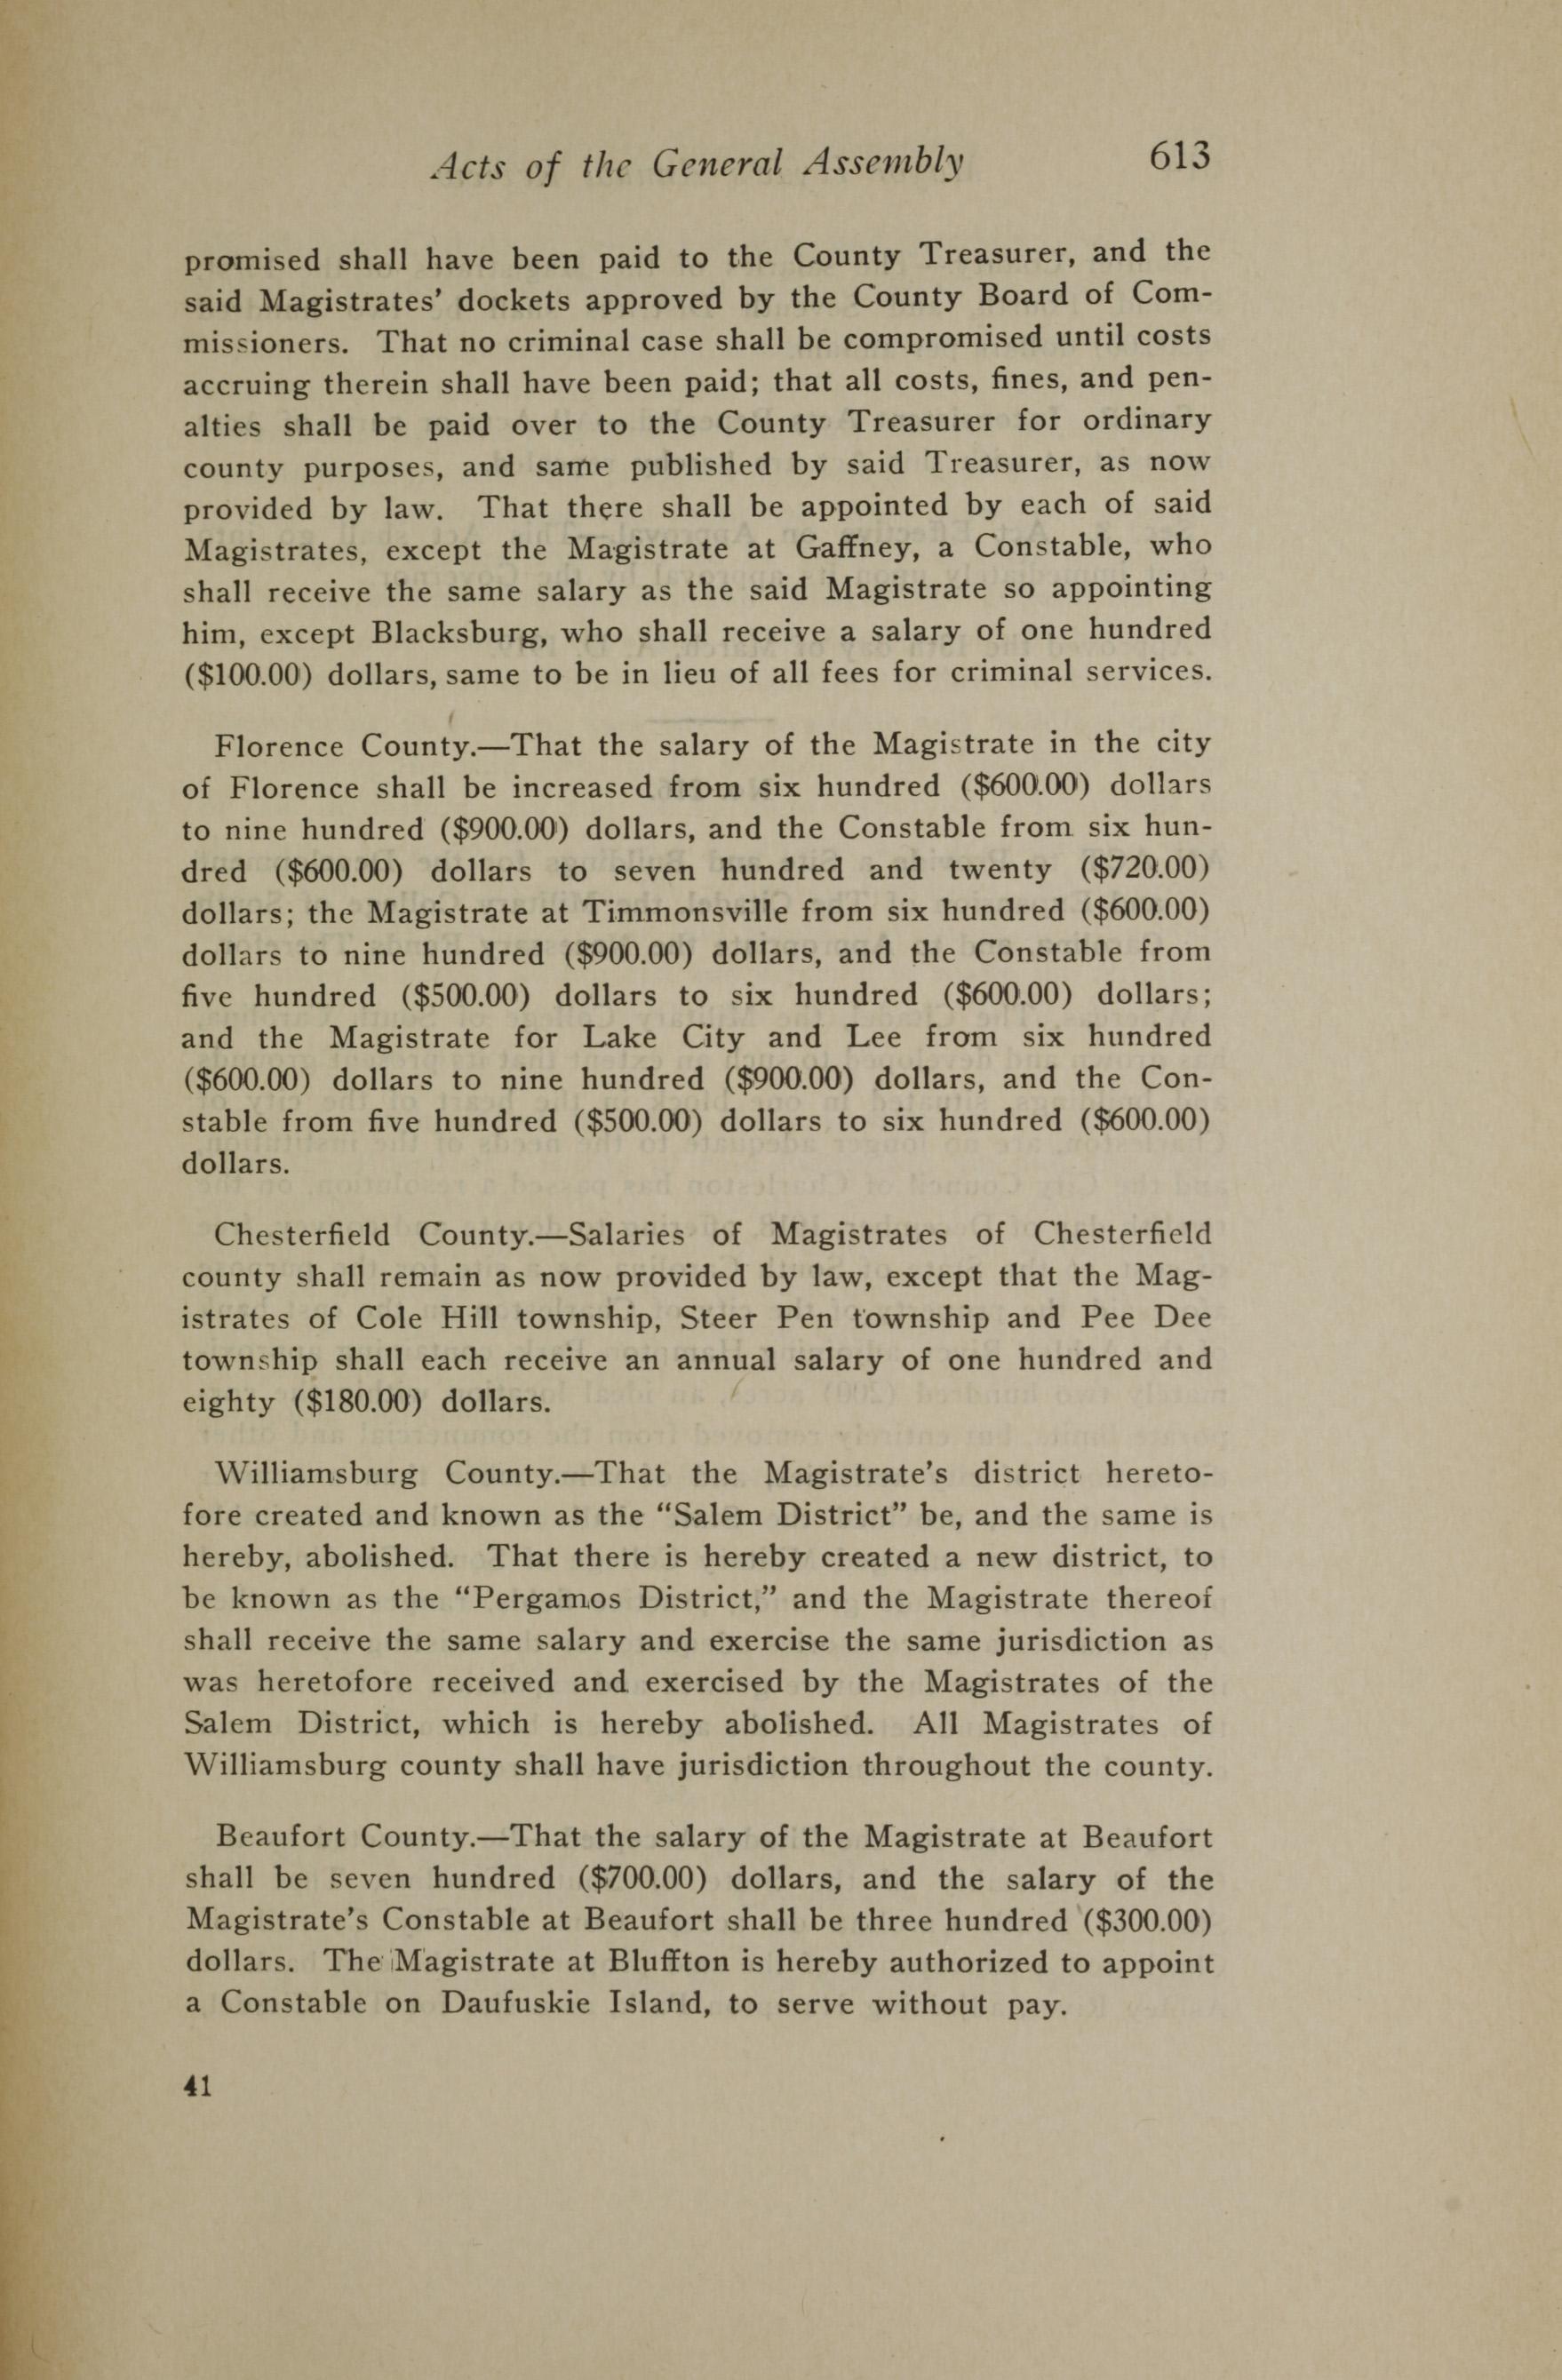 Charleston Yearbook, 1919, page 613